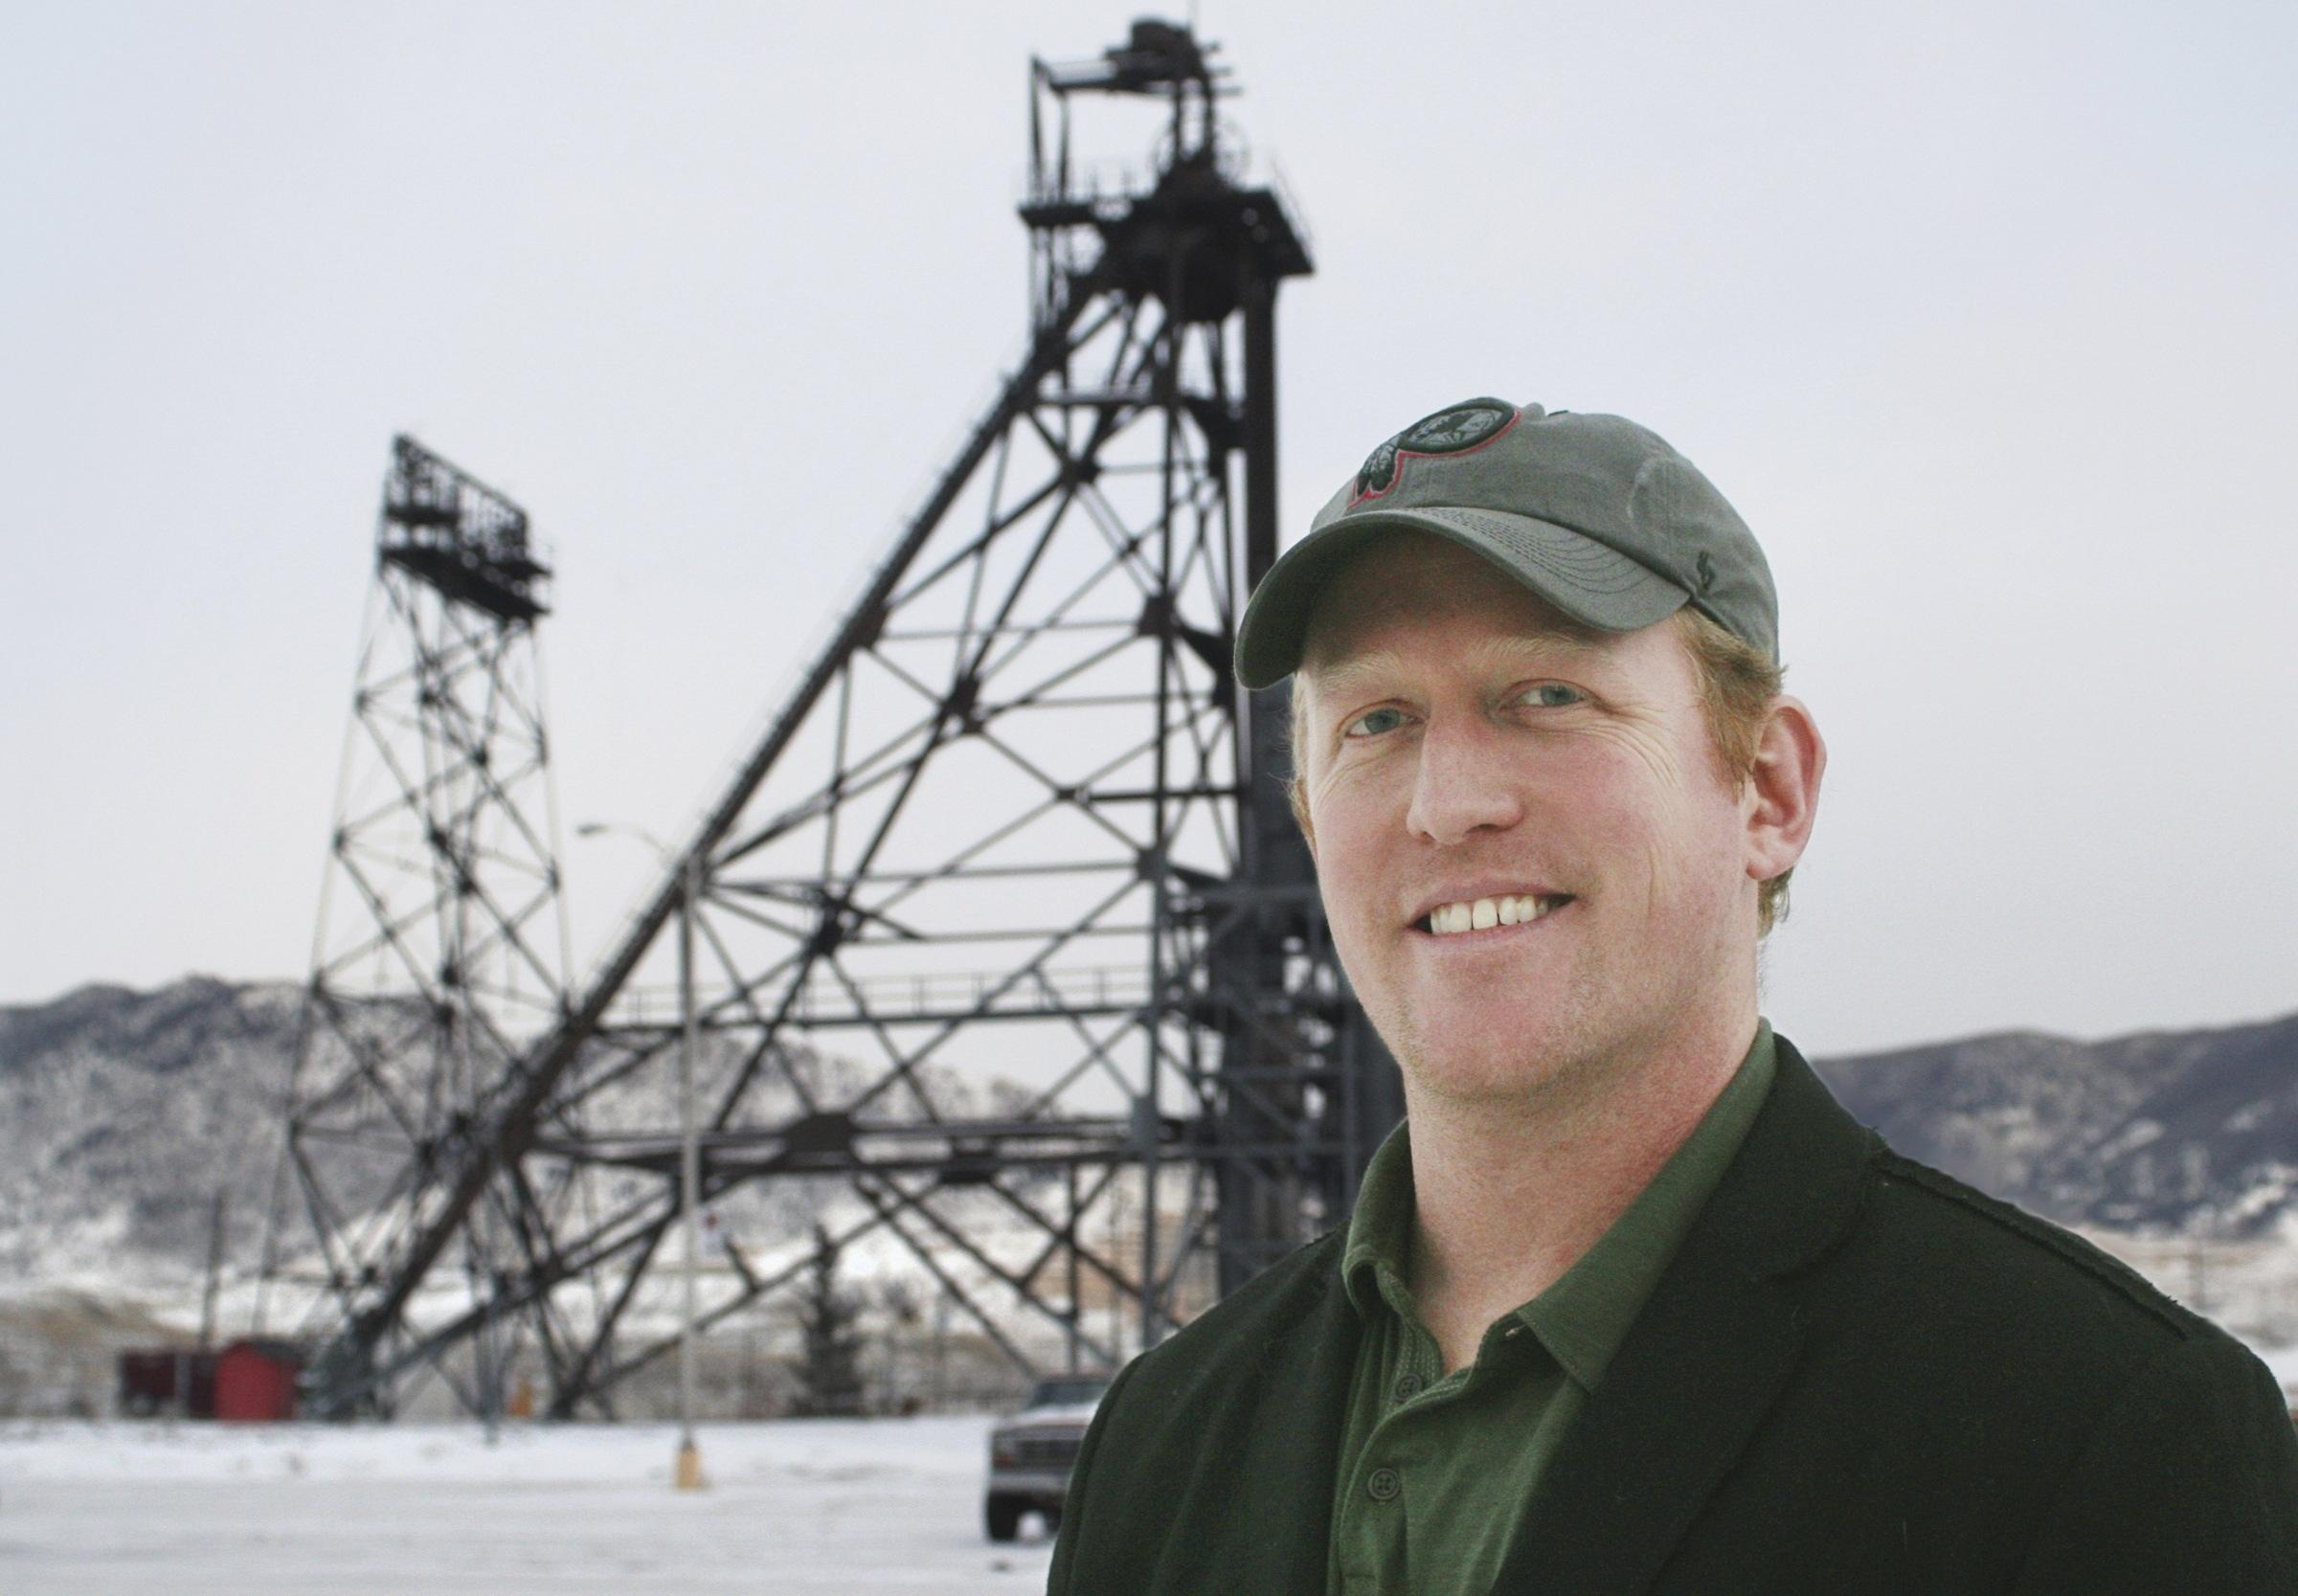 Rob O'Neill DUI: Charge dropped against Navy SEAL who said he killed